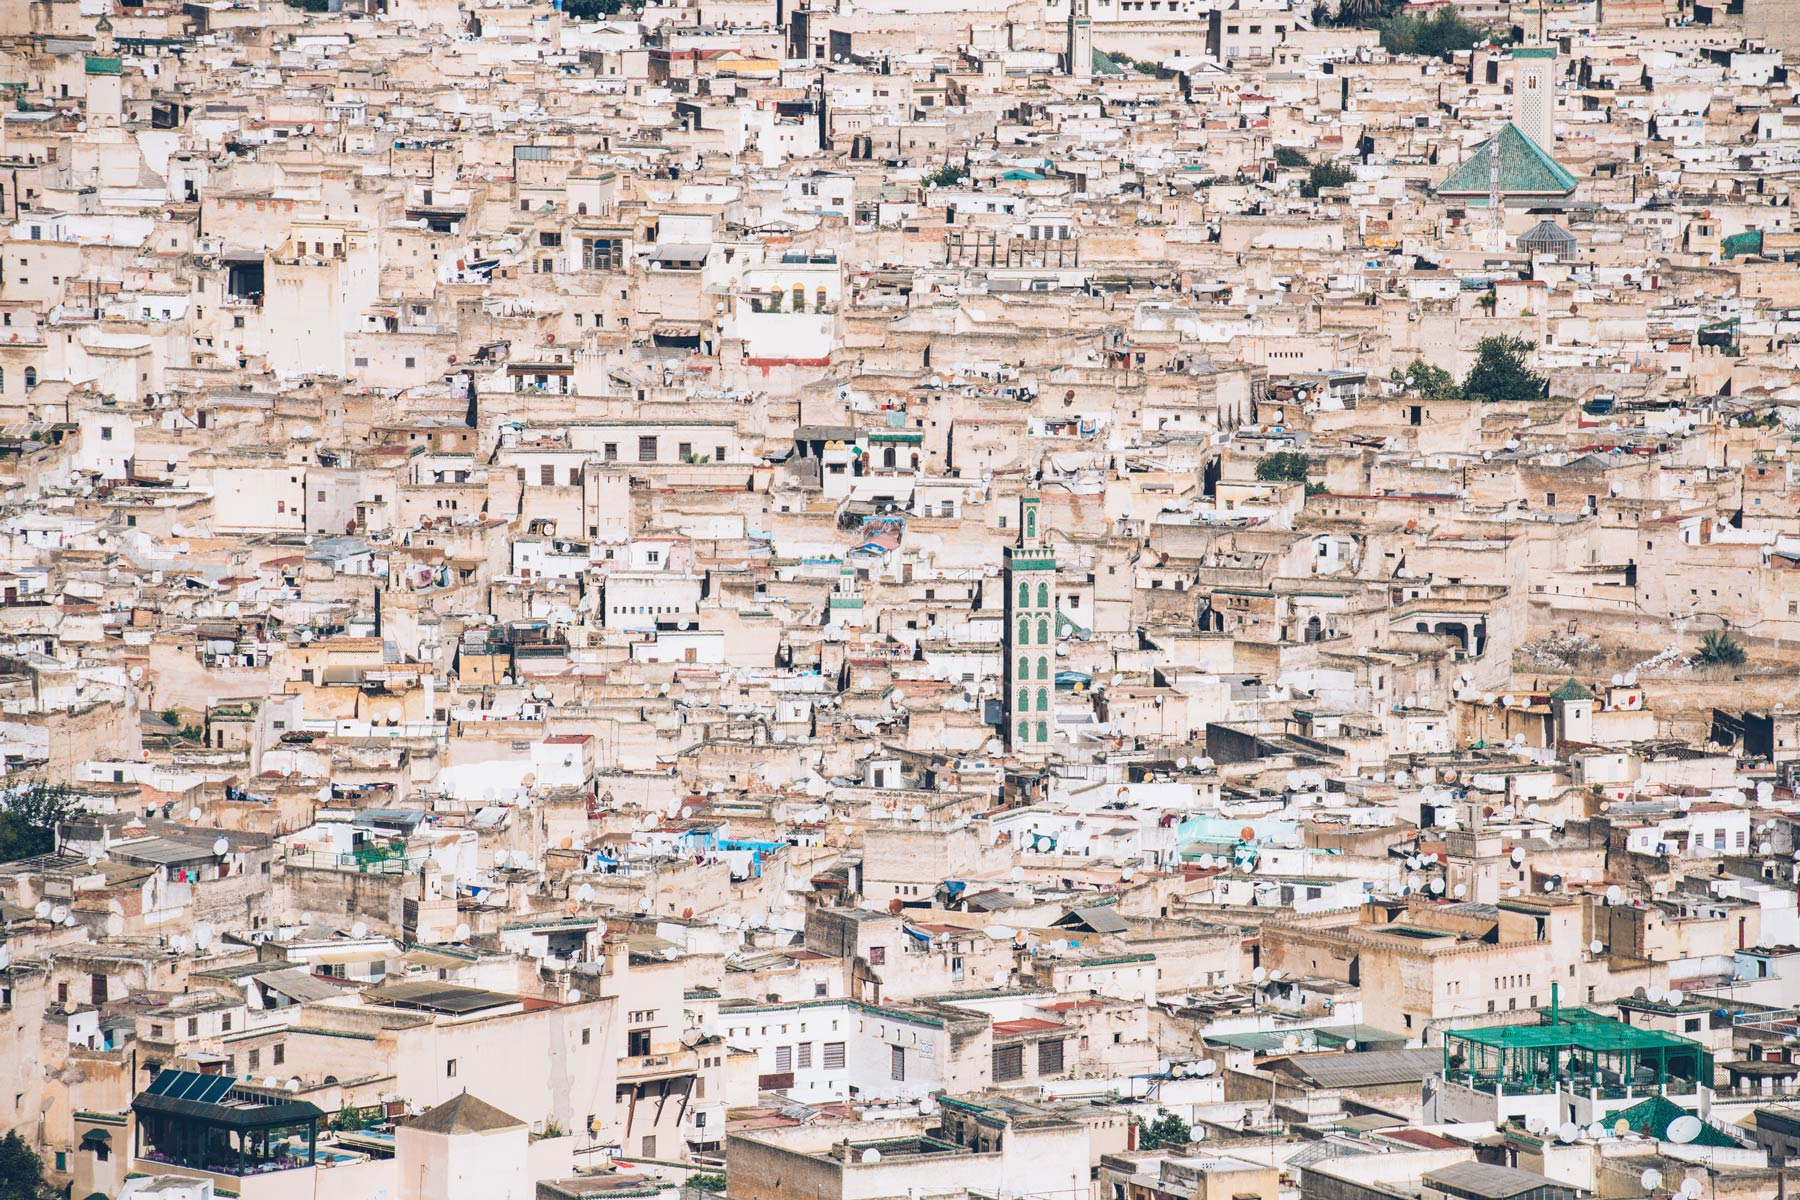 Visiter Fès au Maroc, Blog Voyage des Bestjobers